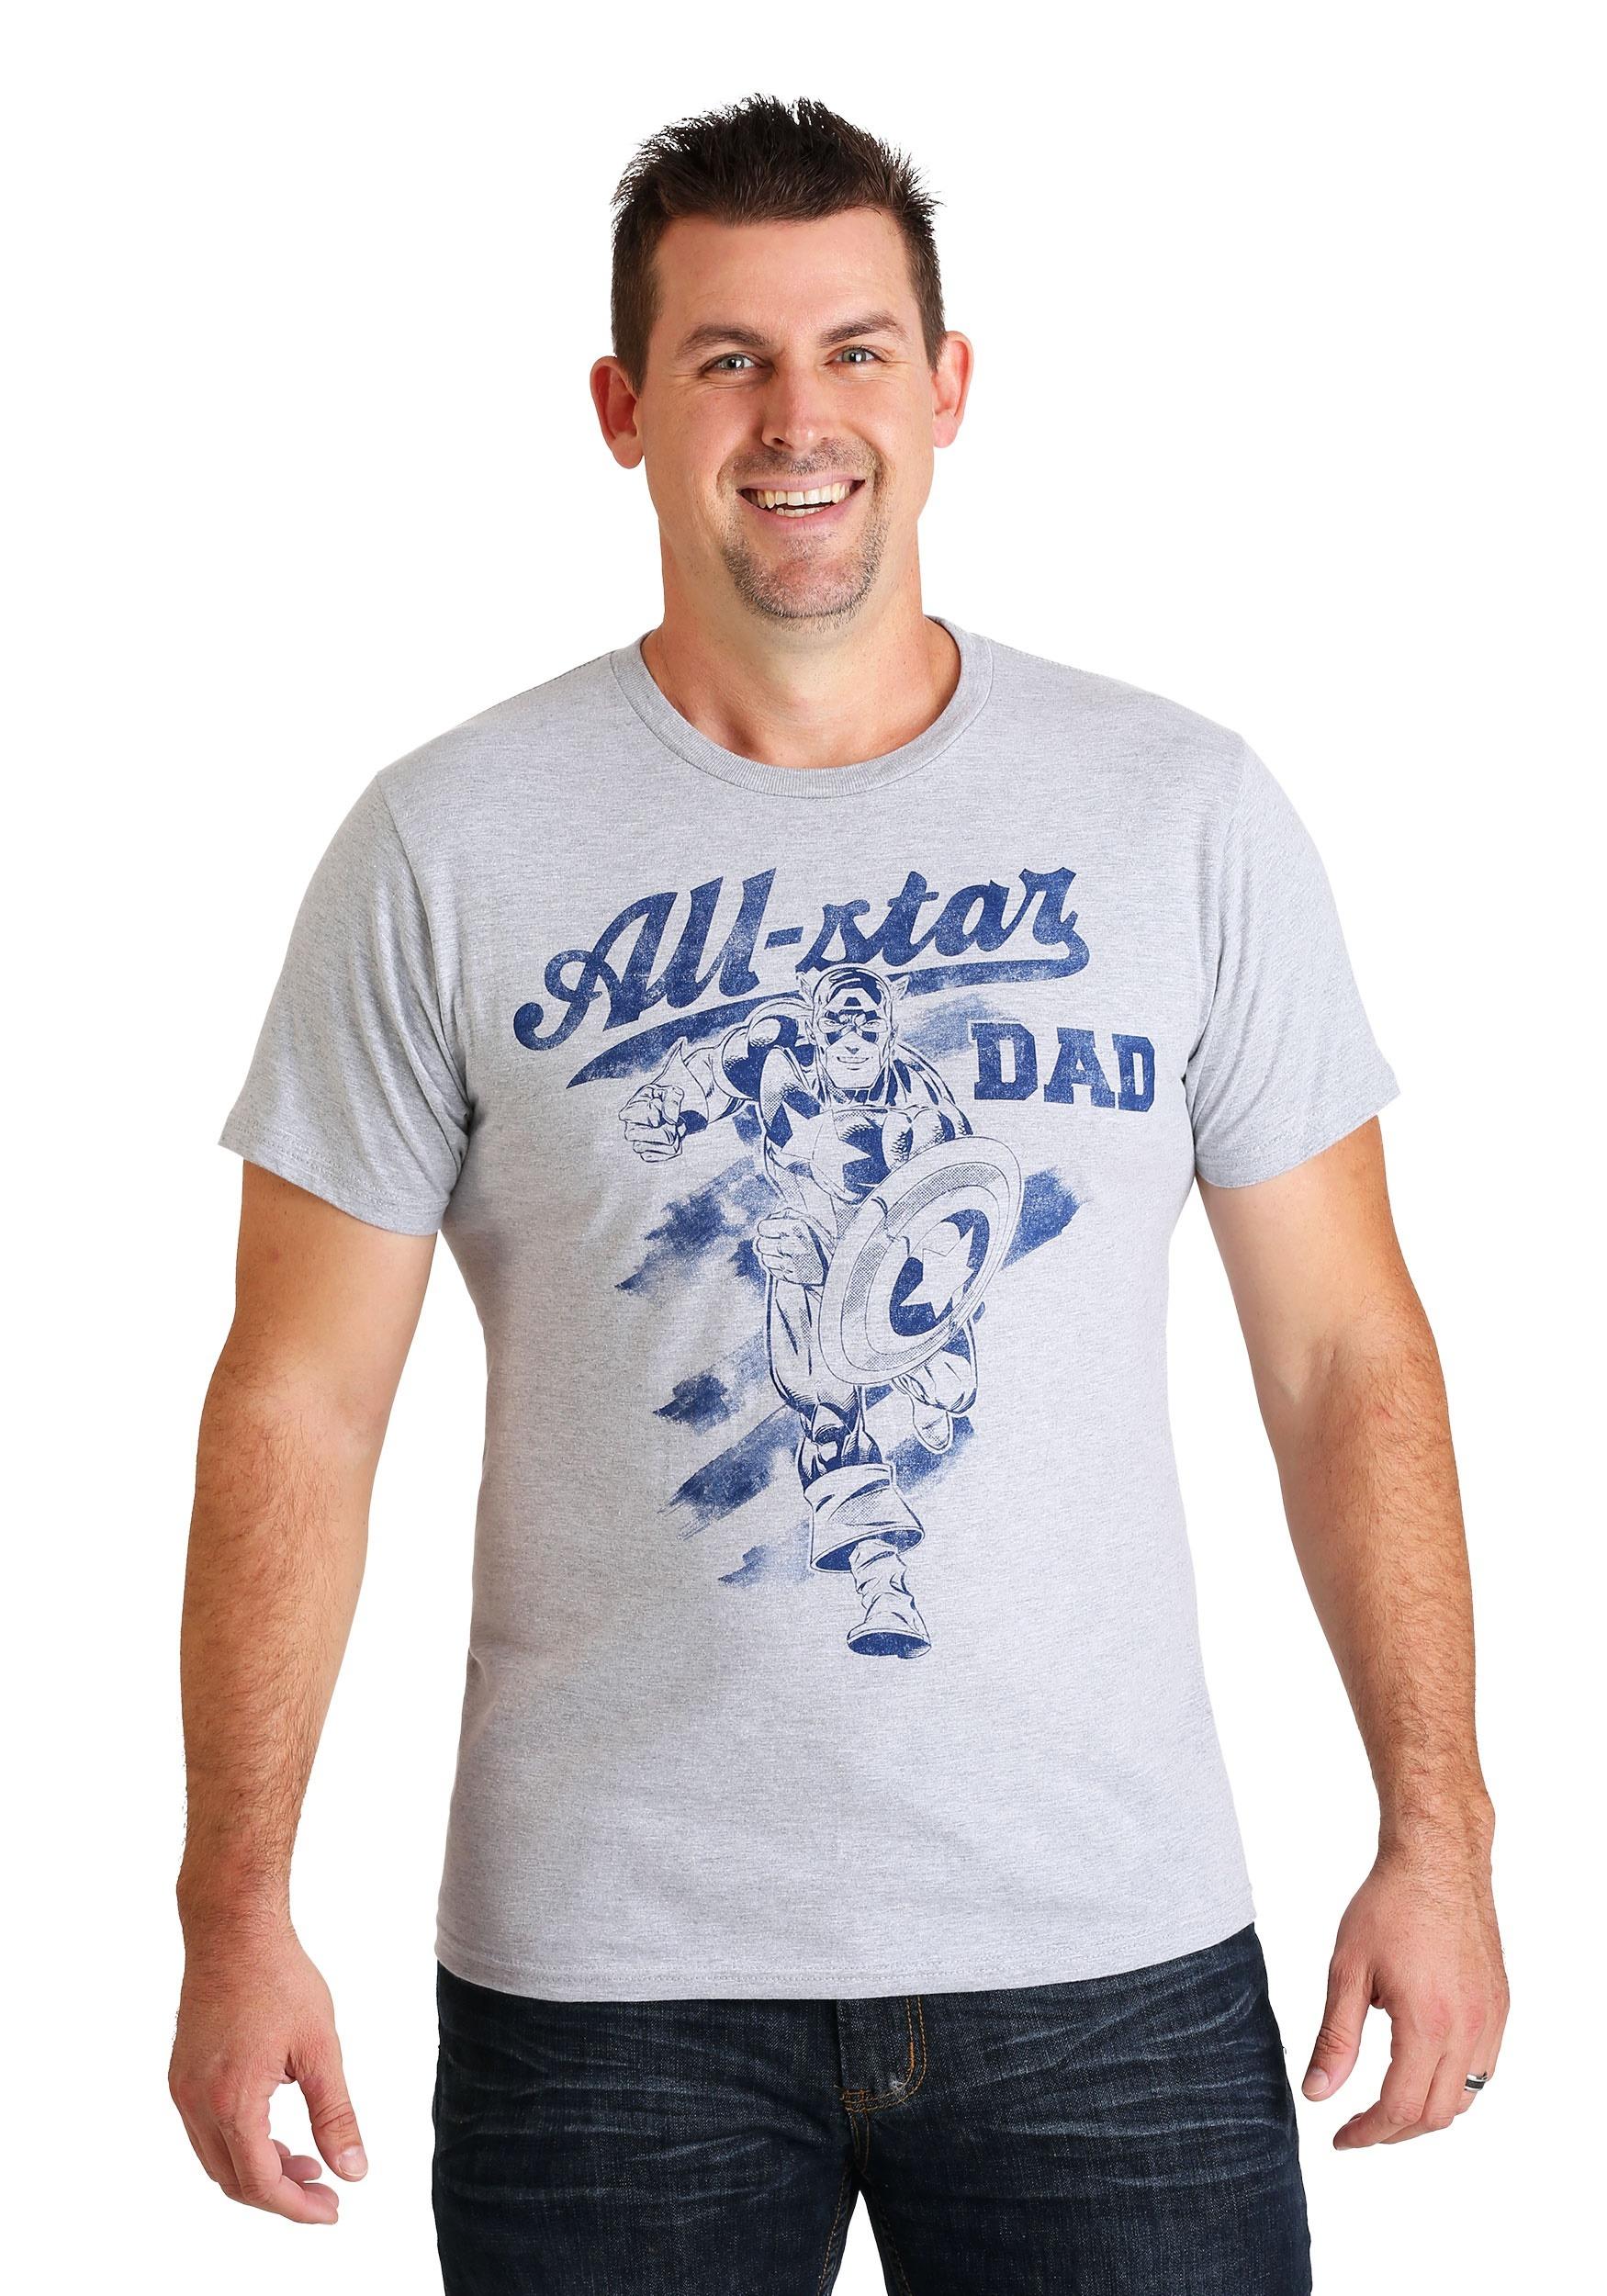 Marvel Captain America All-Star Dad T-Shirt